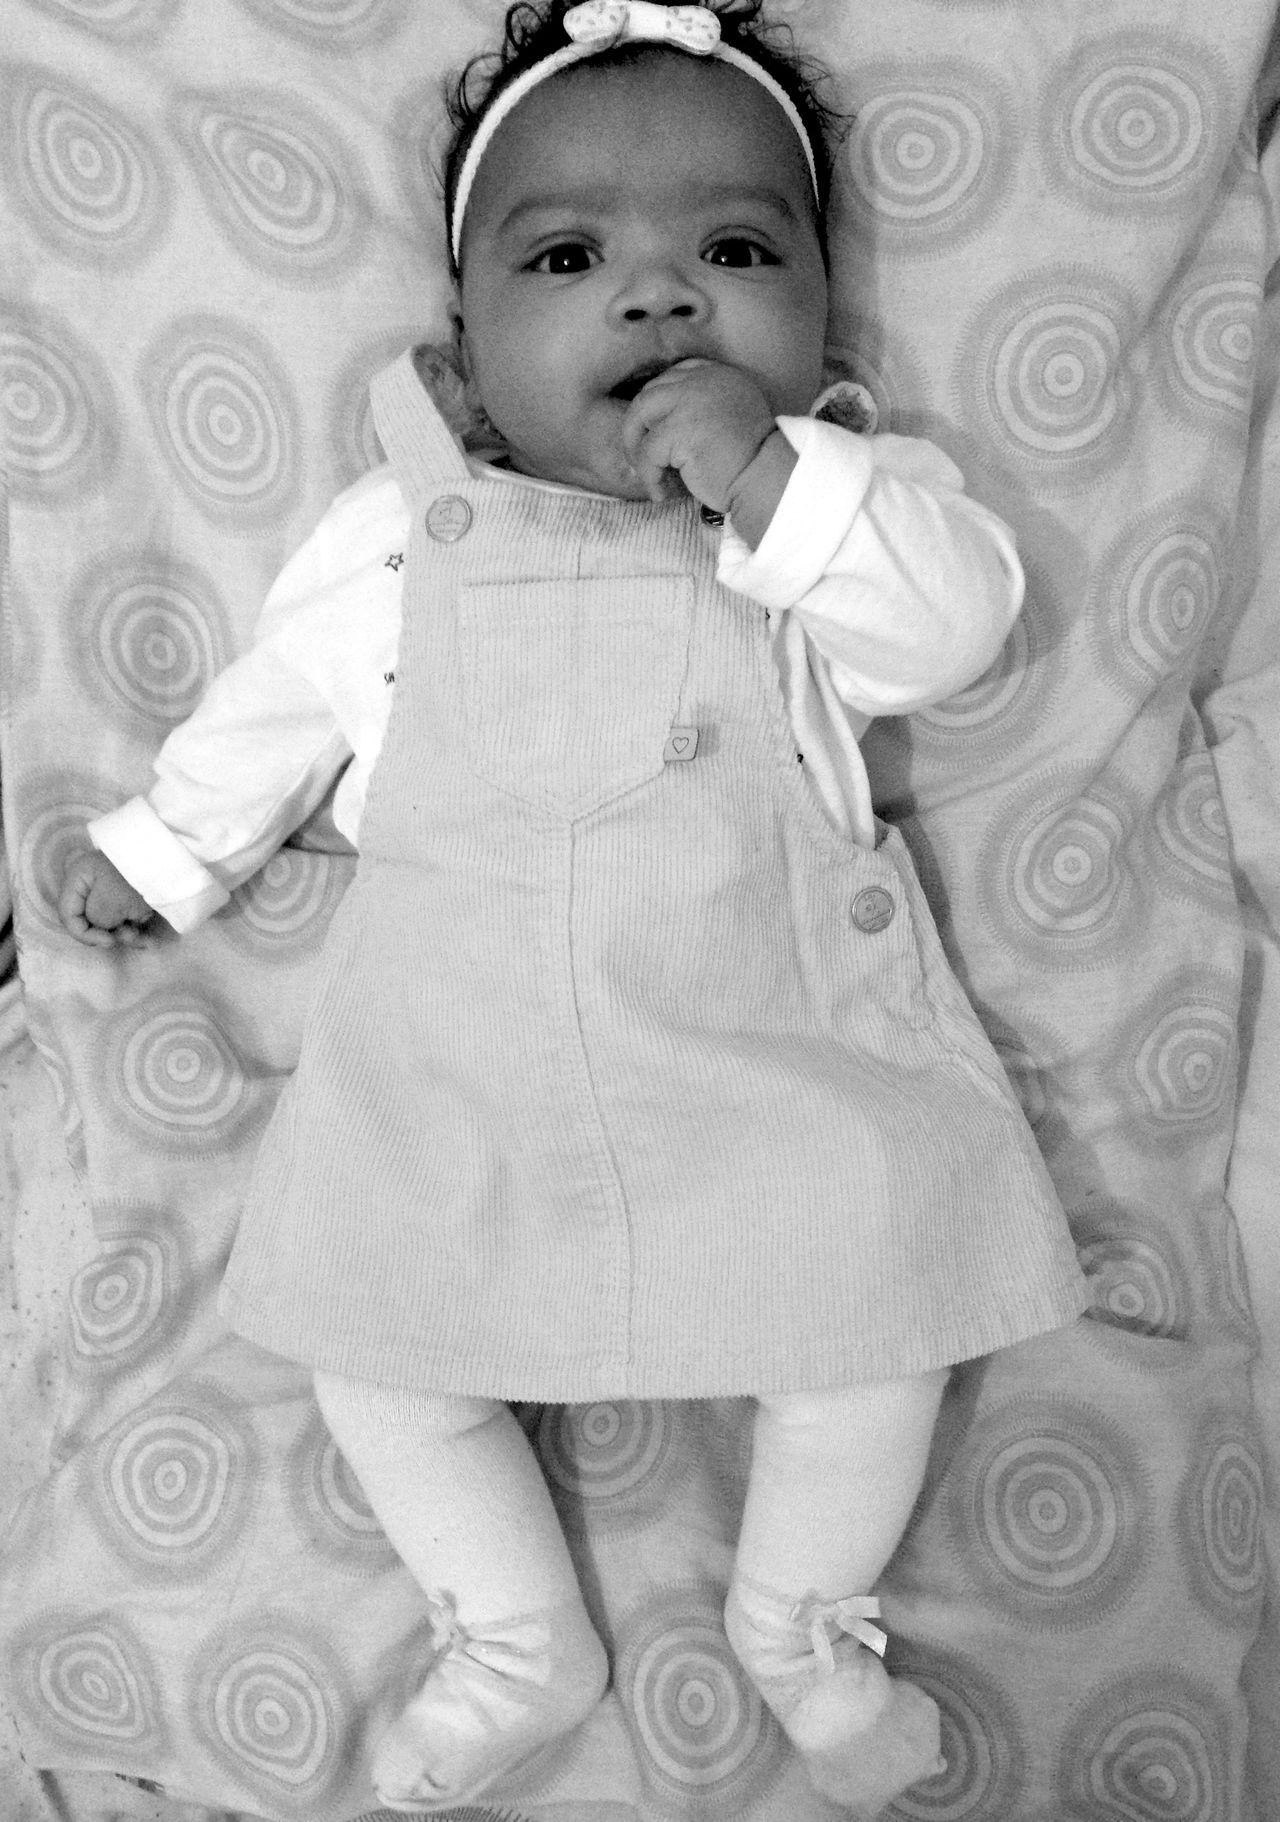 Blackandwhite Baby Princess Lying Down